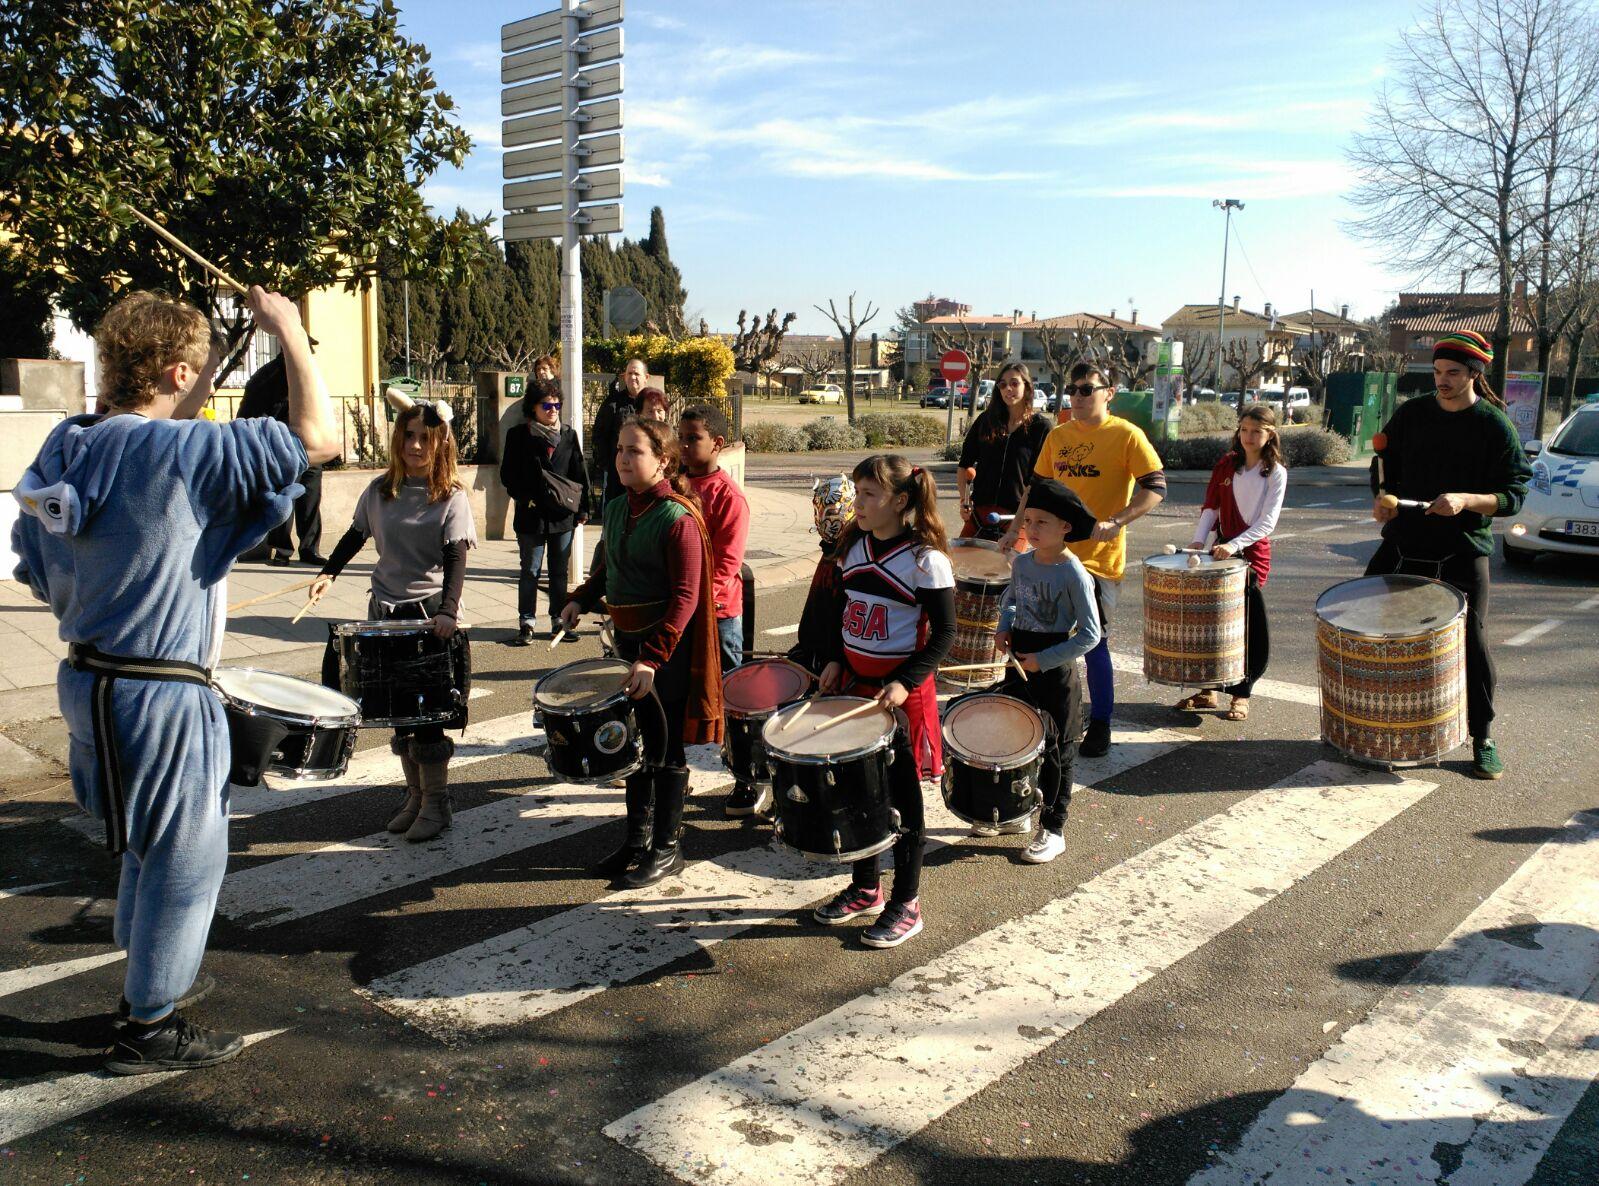 PetiTXKS al Carnaval de Celrà - (18.02.18)